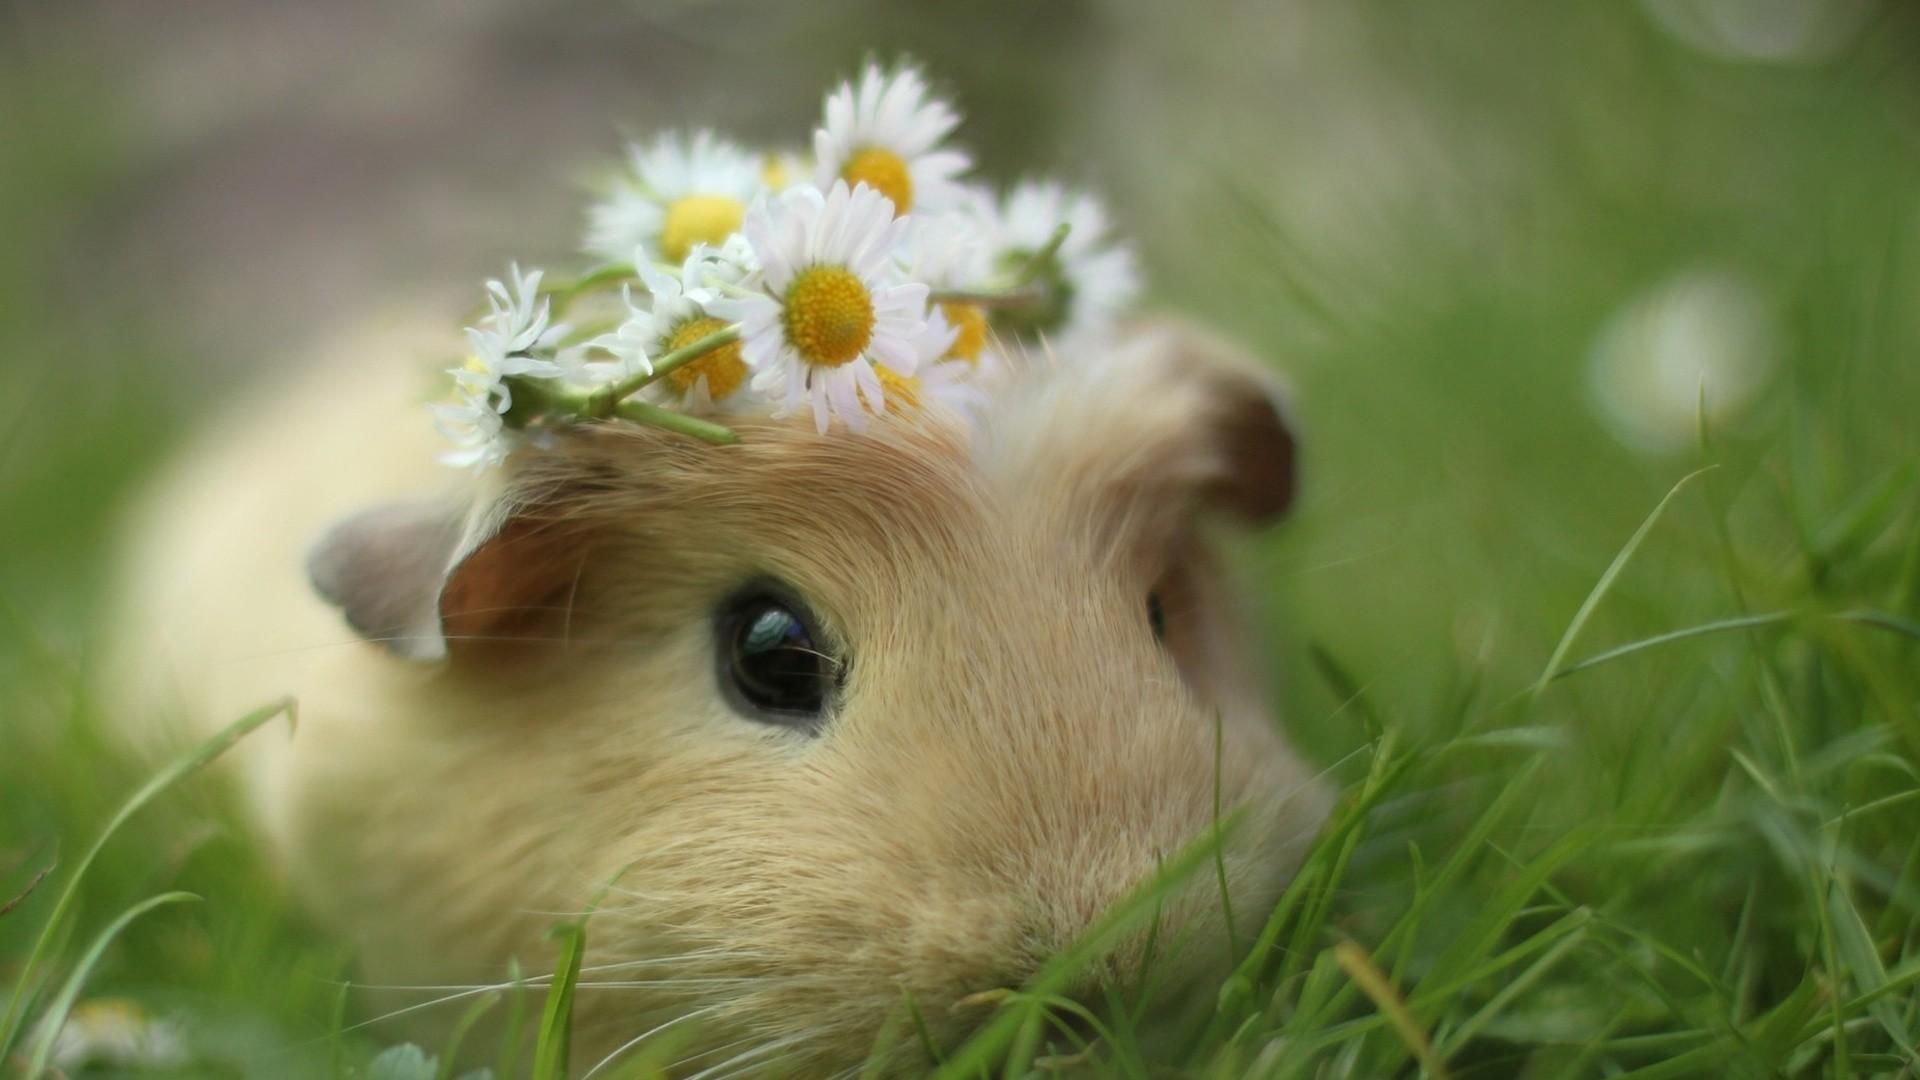 Beautiful Guinea Pig Desktop Widescreen Image